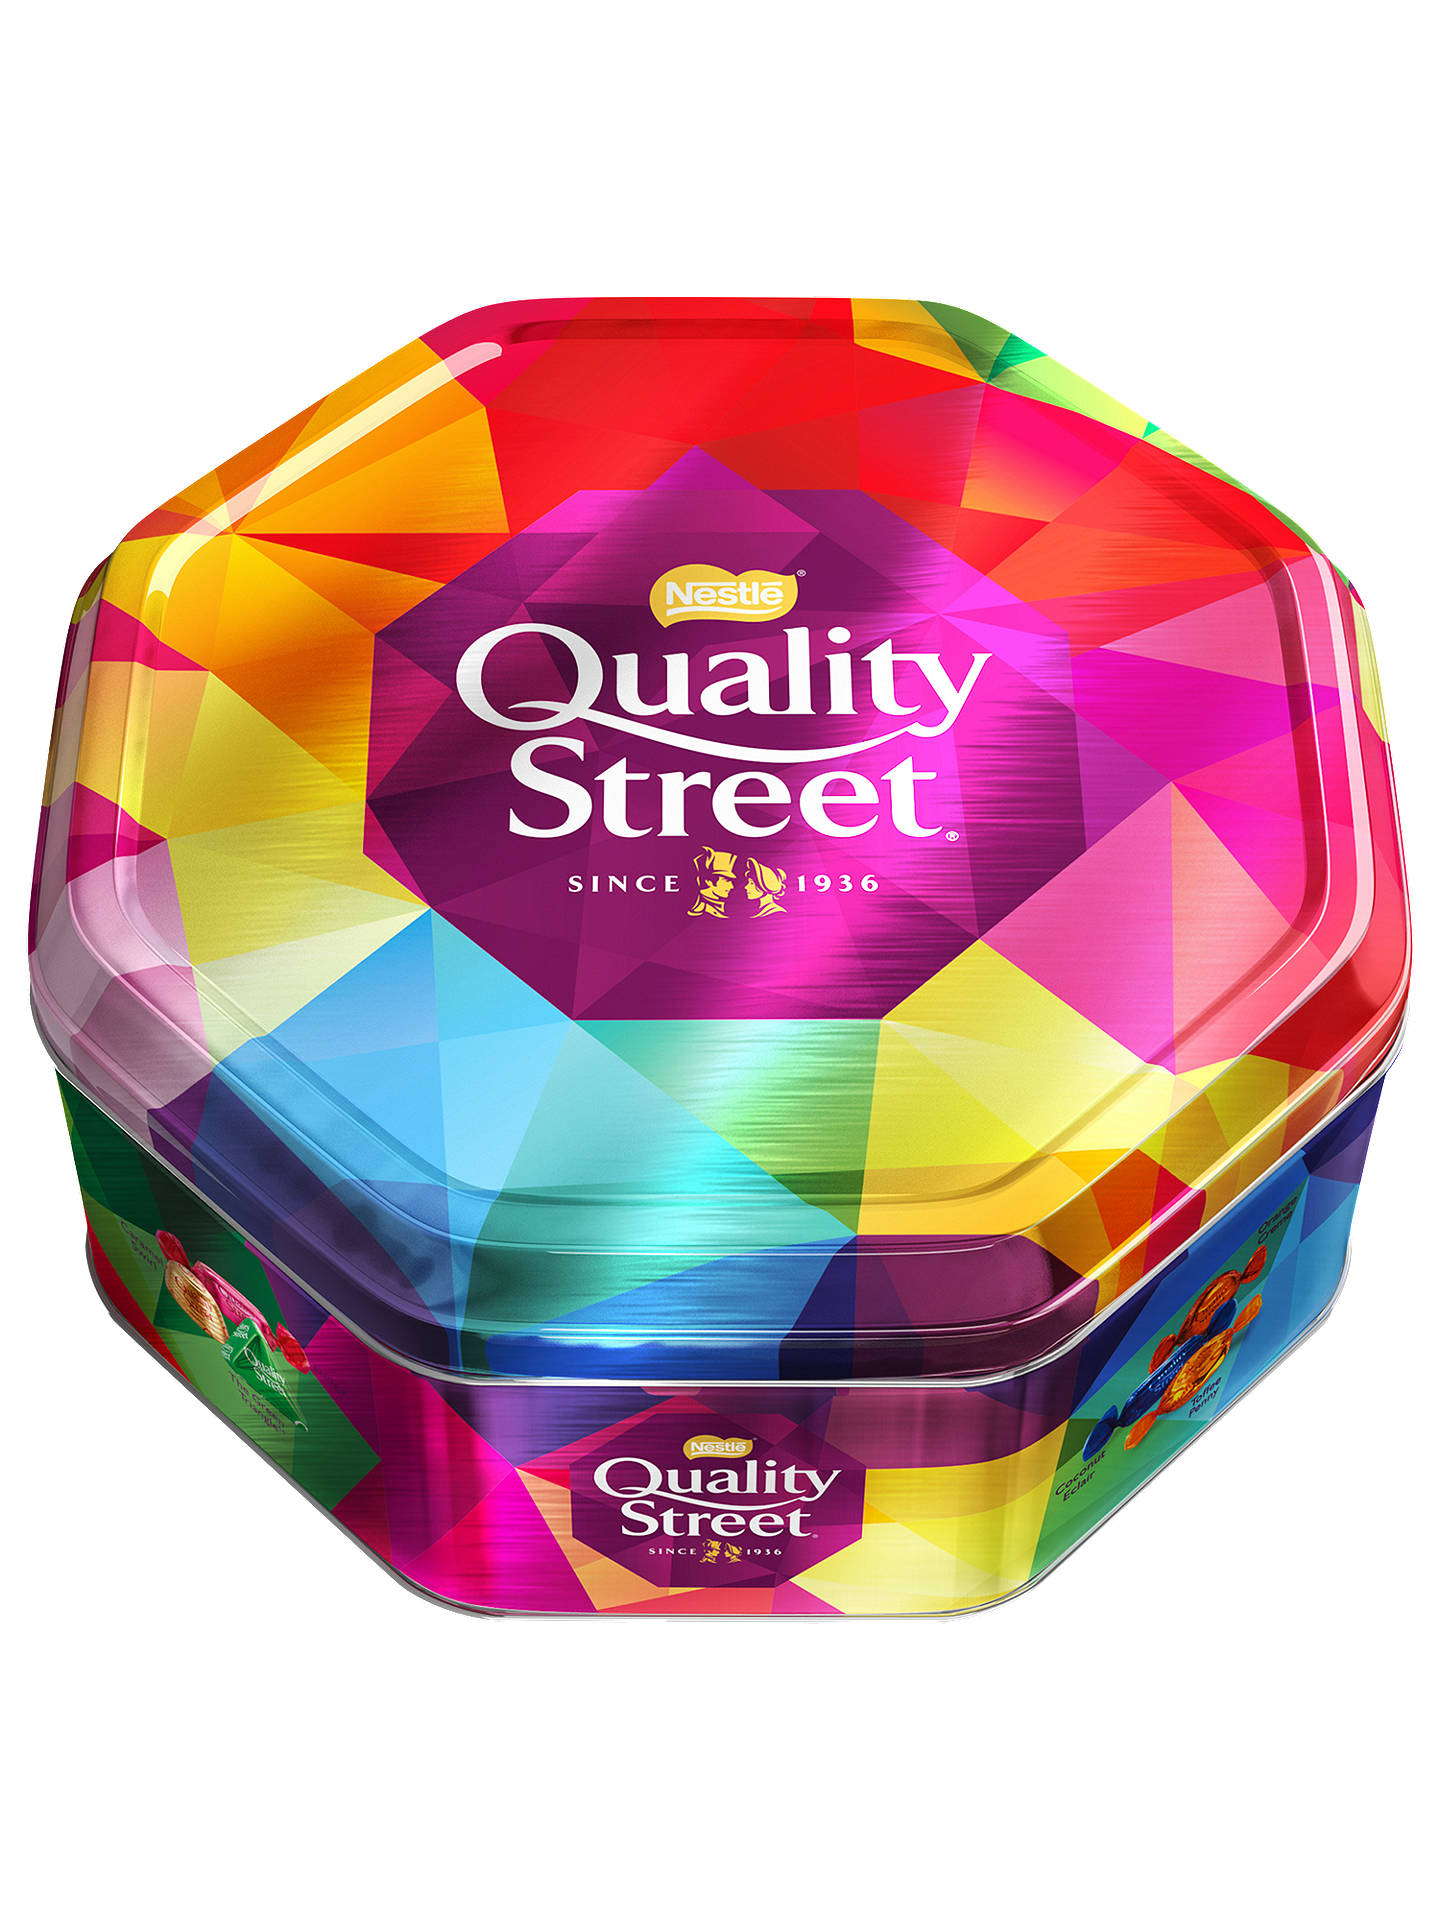 Nestle Quality Street Tin 1 2kg